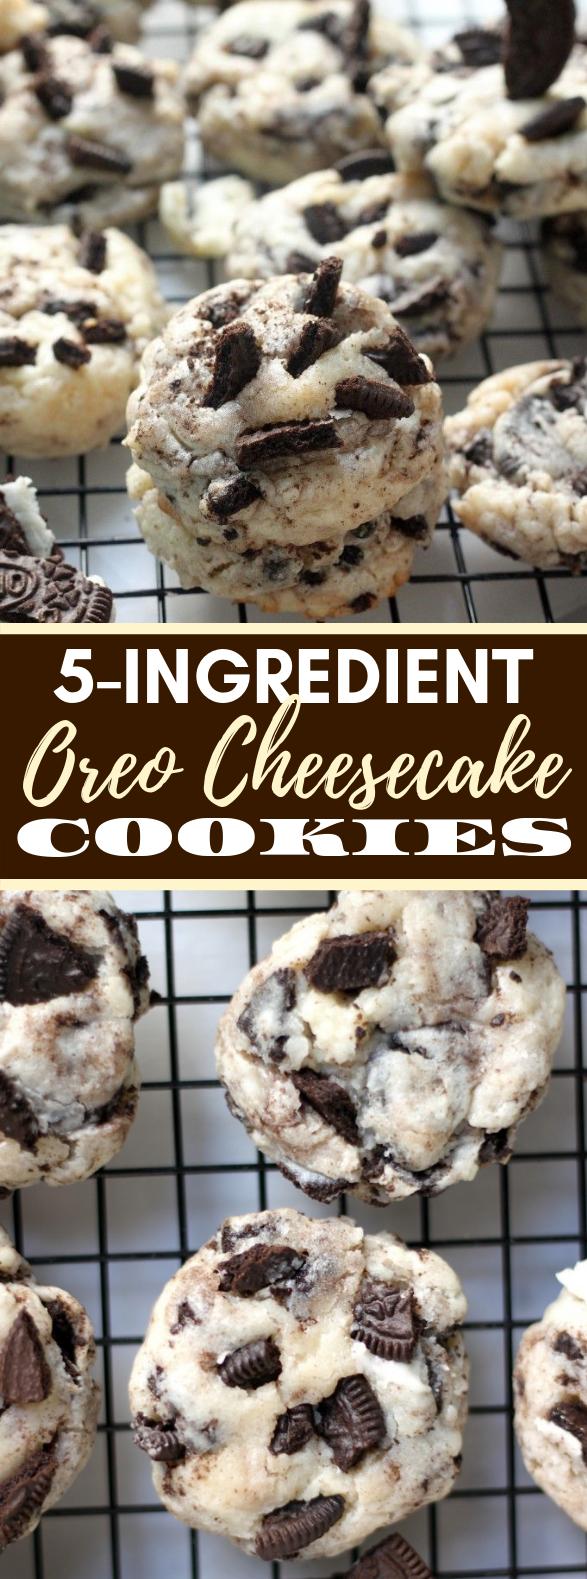 5-Ingredient Oreo Cheesecake Cookies #desserts #sweets